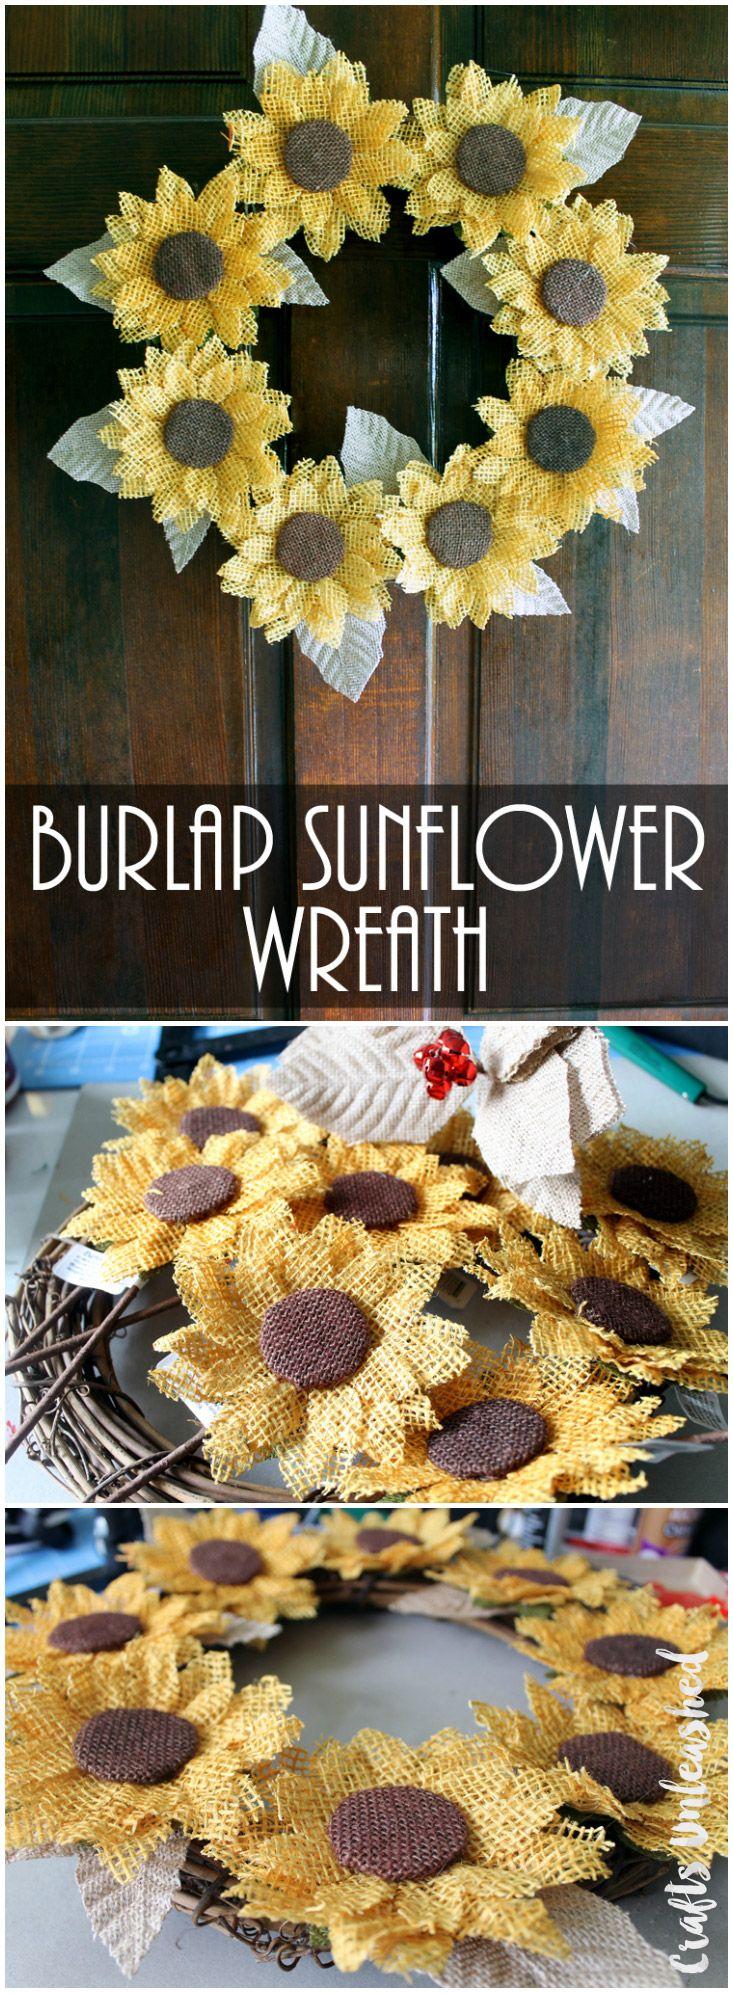 Burlap Sunflower Wreath DIY                                                                                                                                                                                 More